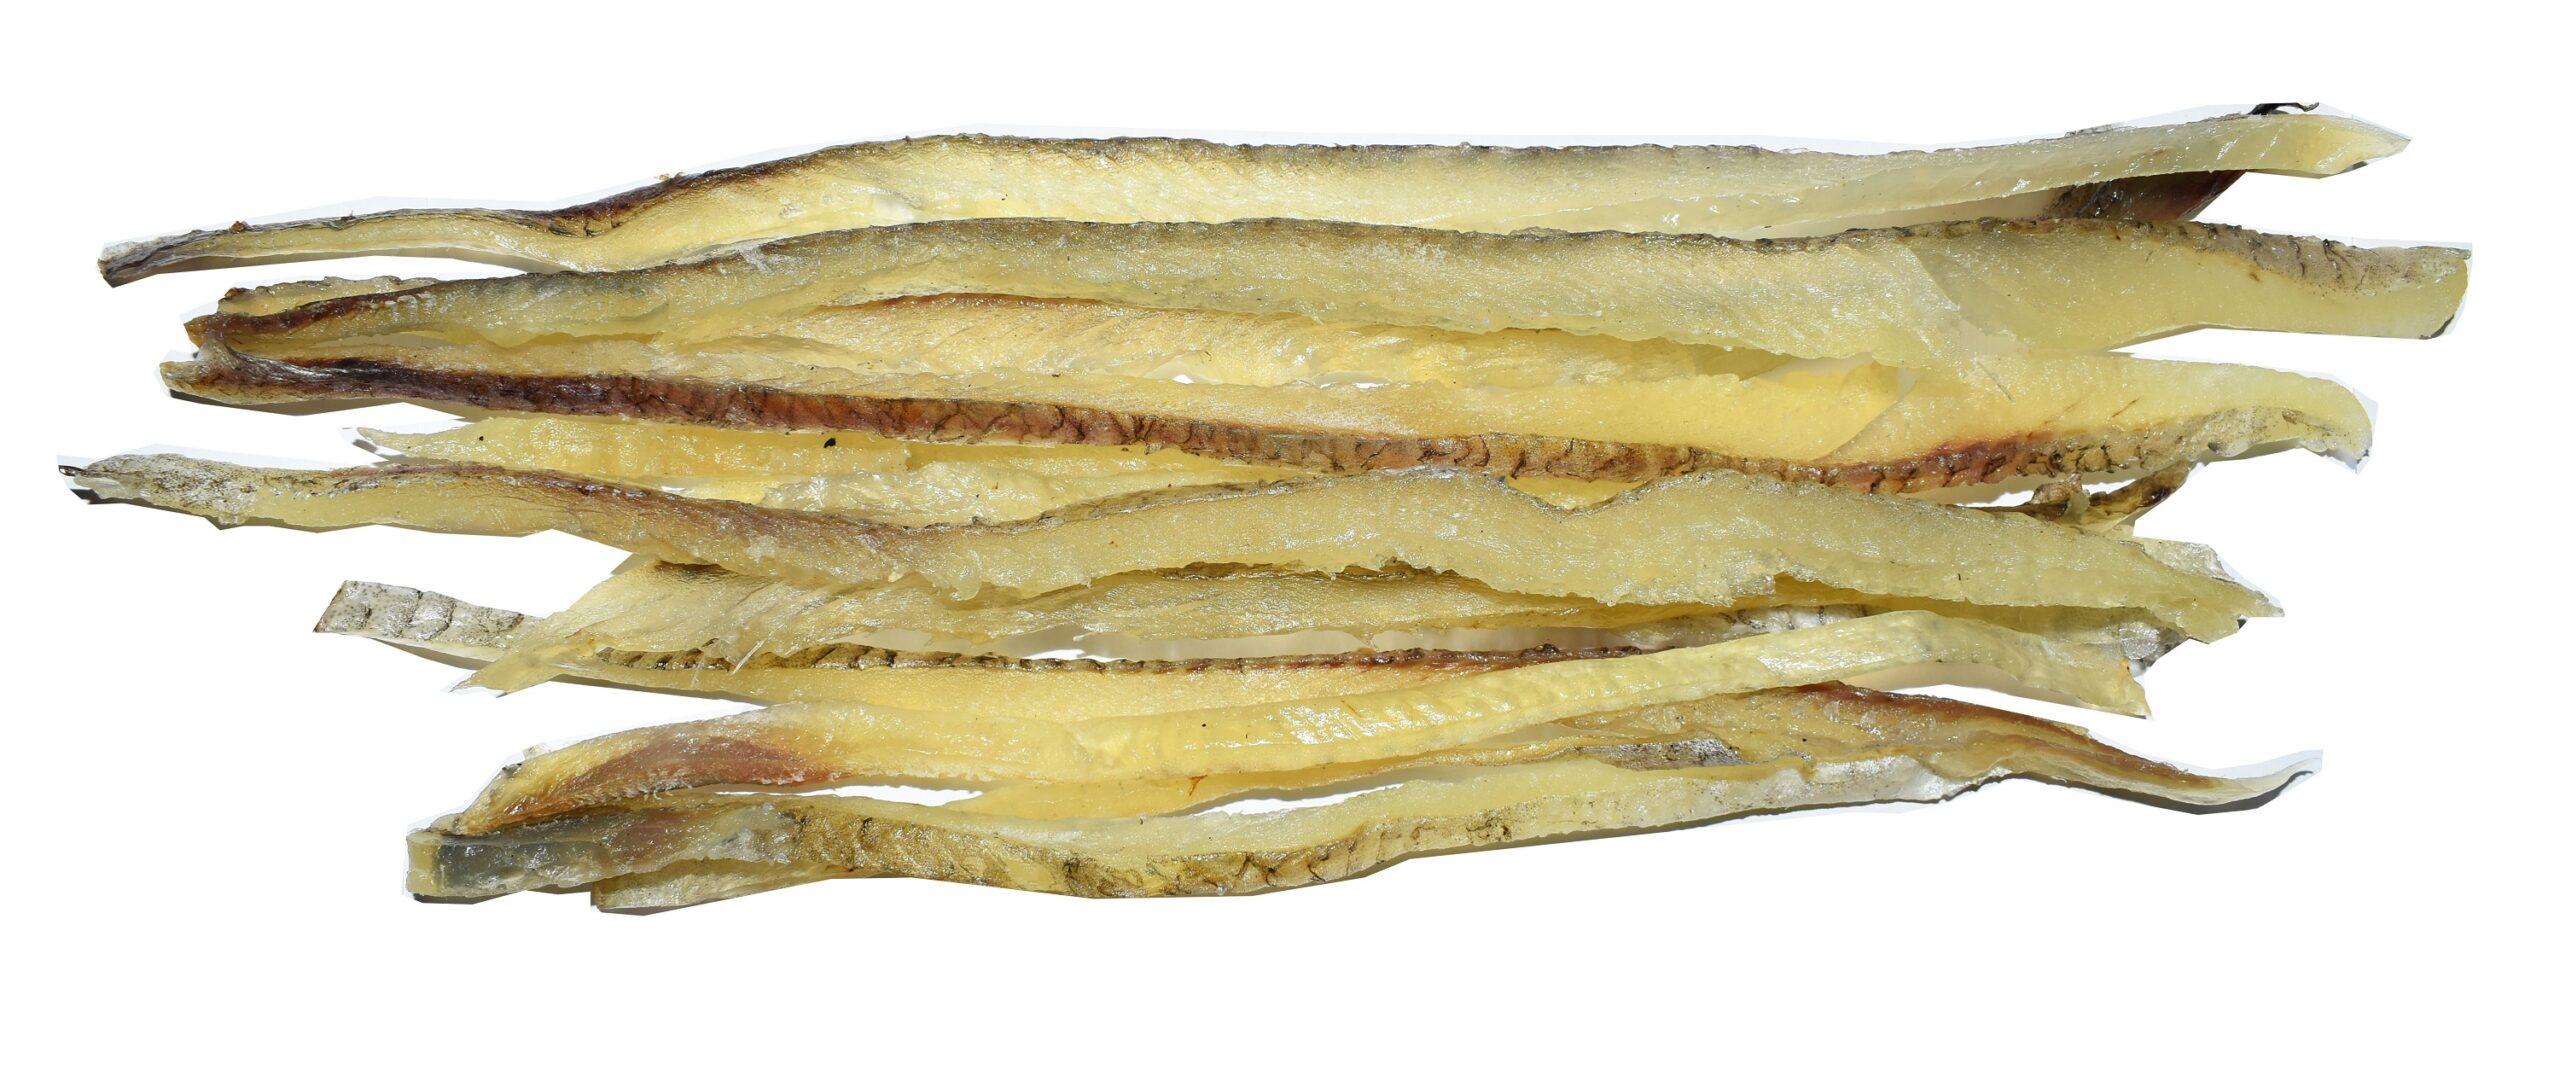 Соломка серебристой корюшки Аргентины вяленая Image